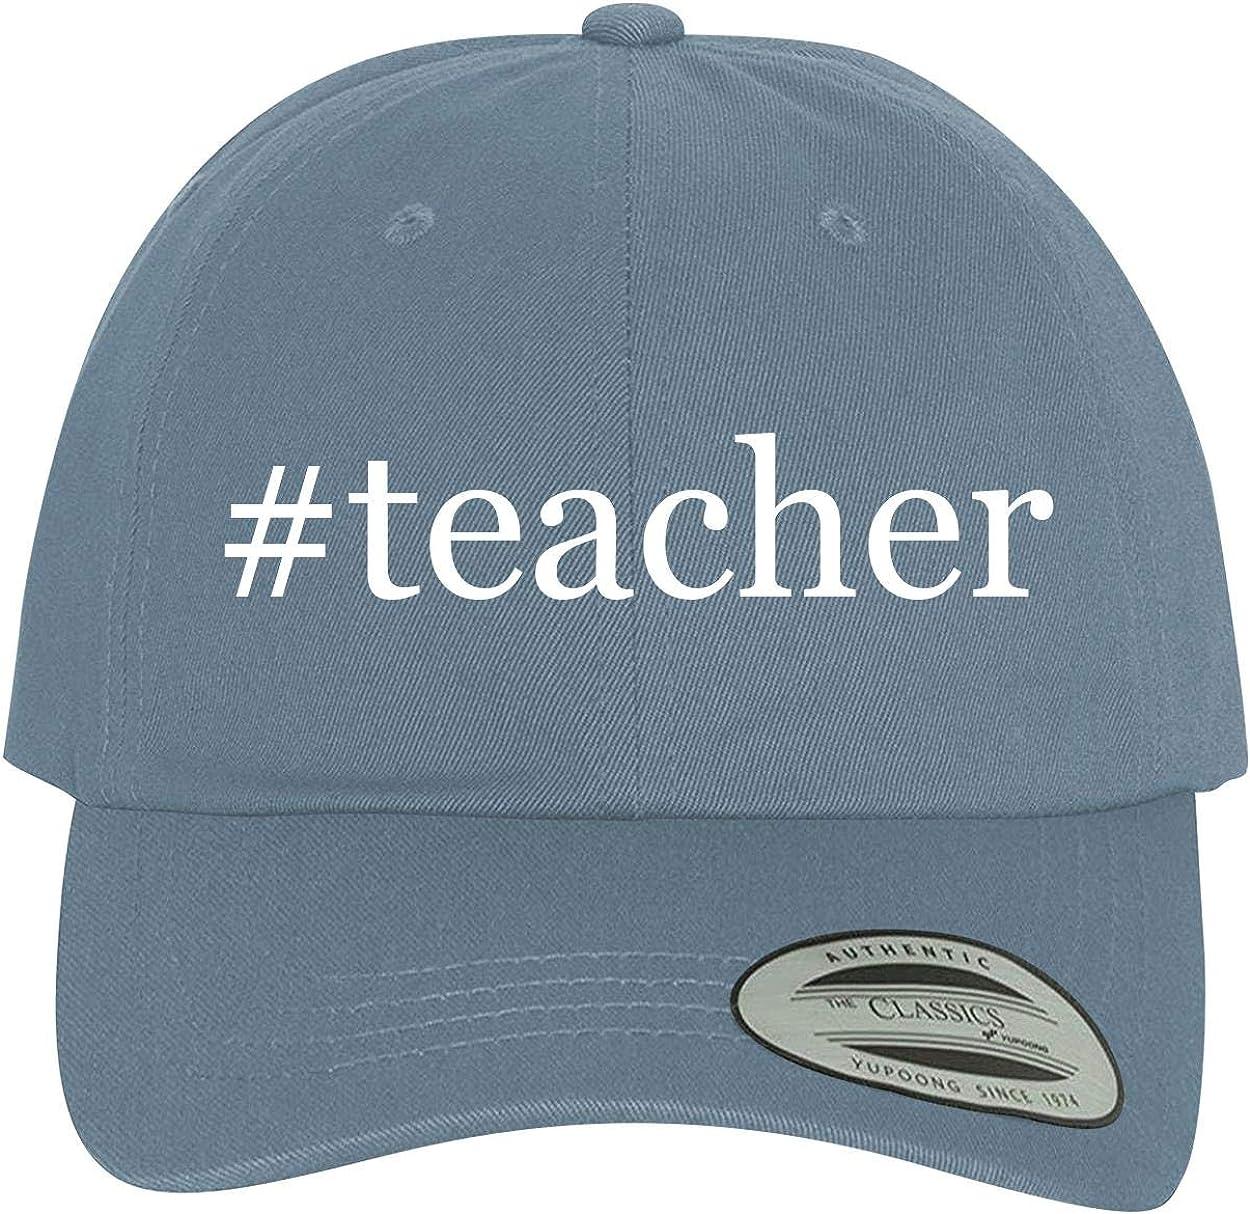 Comfortable Dad Hat Baseball Cap BH Cool Designs #Teacher